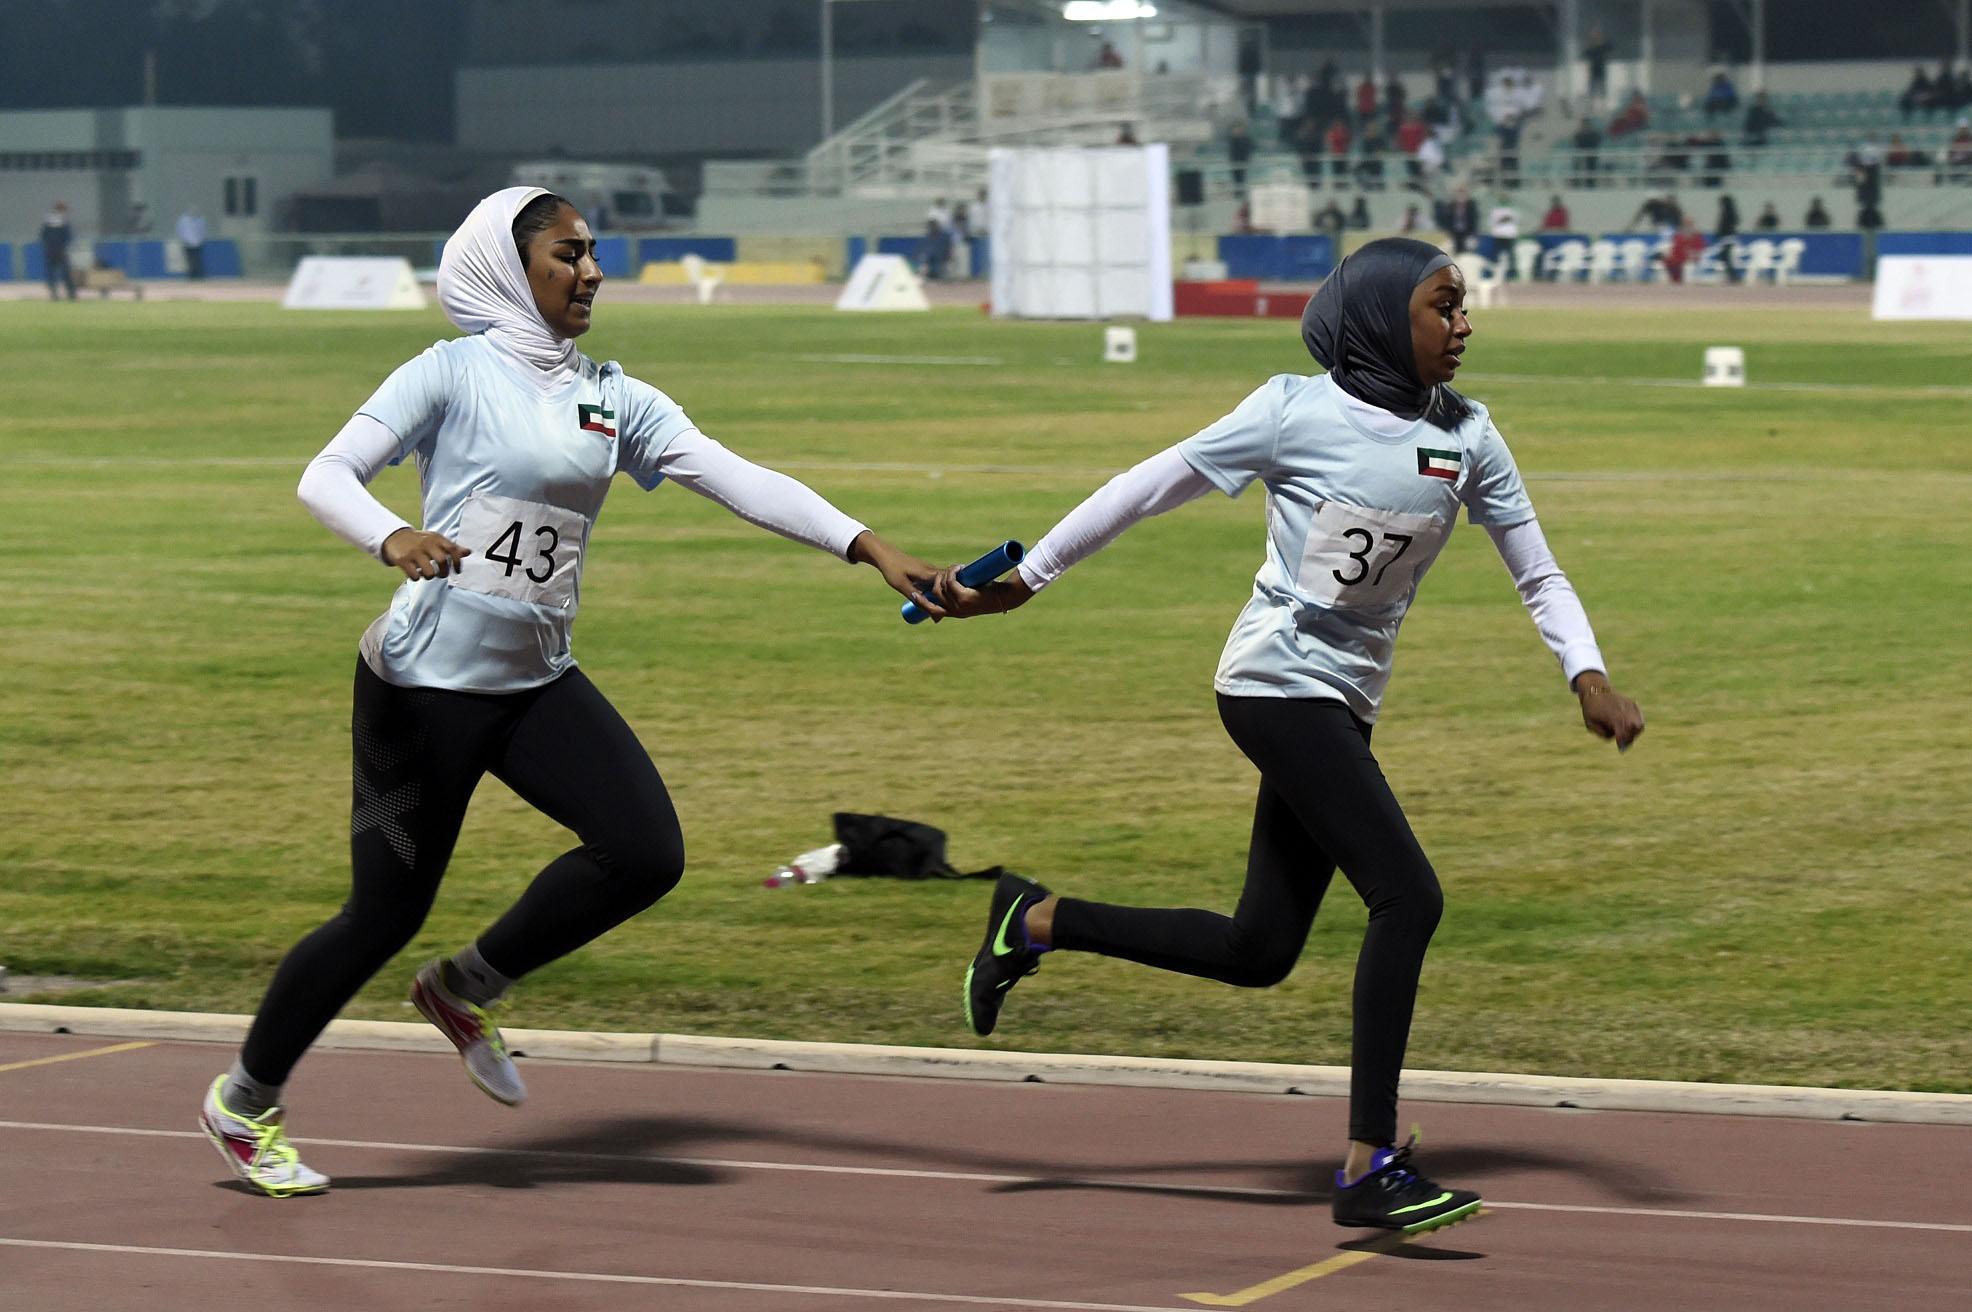 awst 2018 showcases advanced status of arab women's sports 6